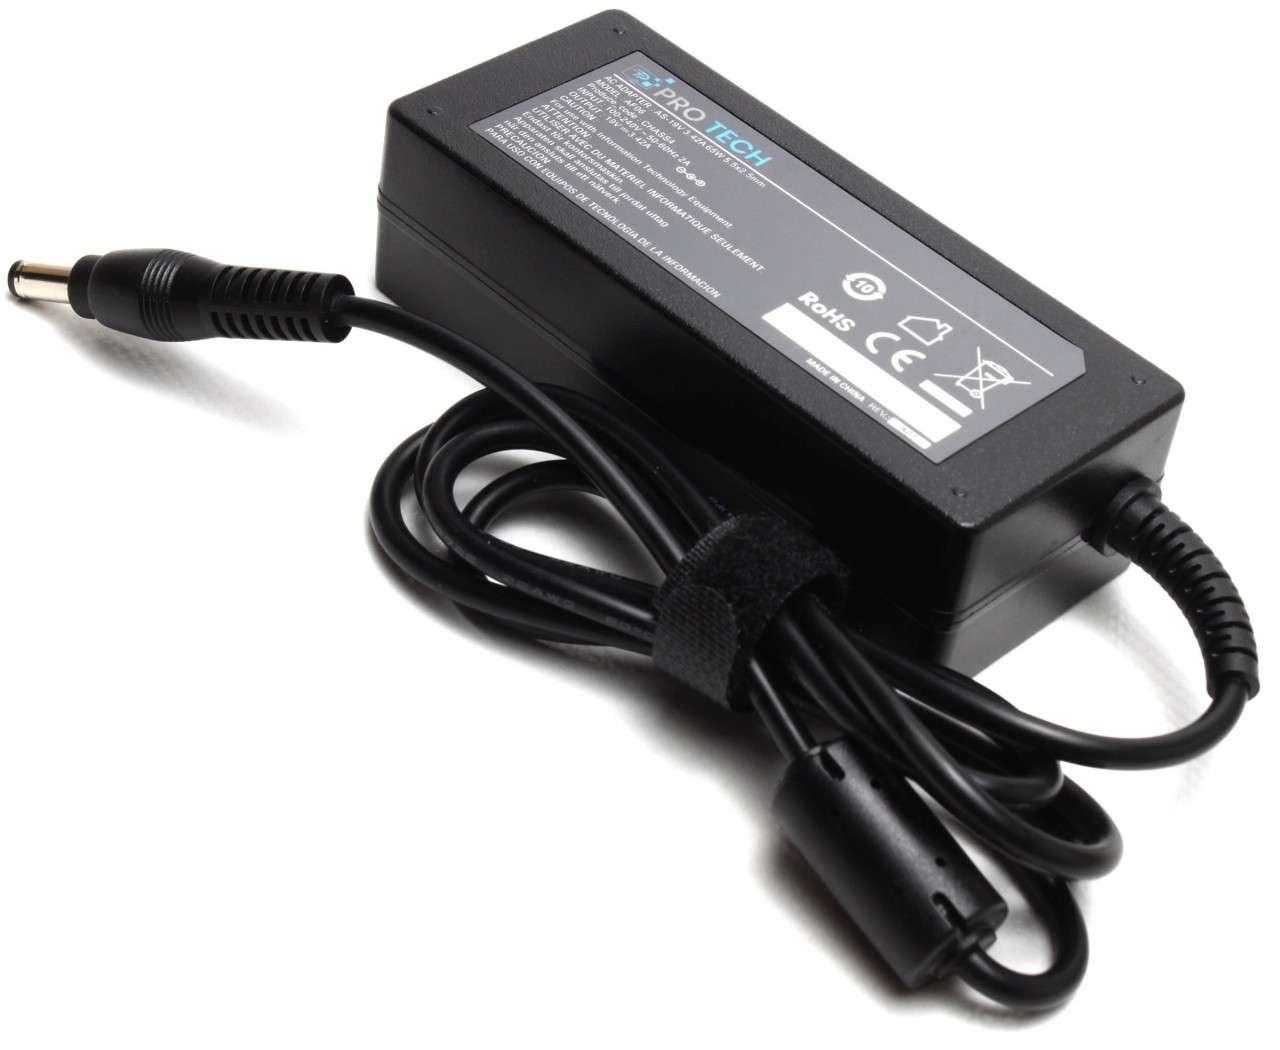 Incarcator Asus X80L Replacement imagine powerlaptop.ro 2021